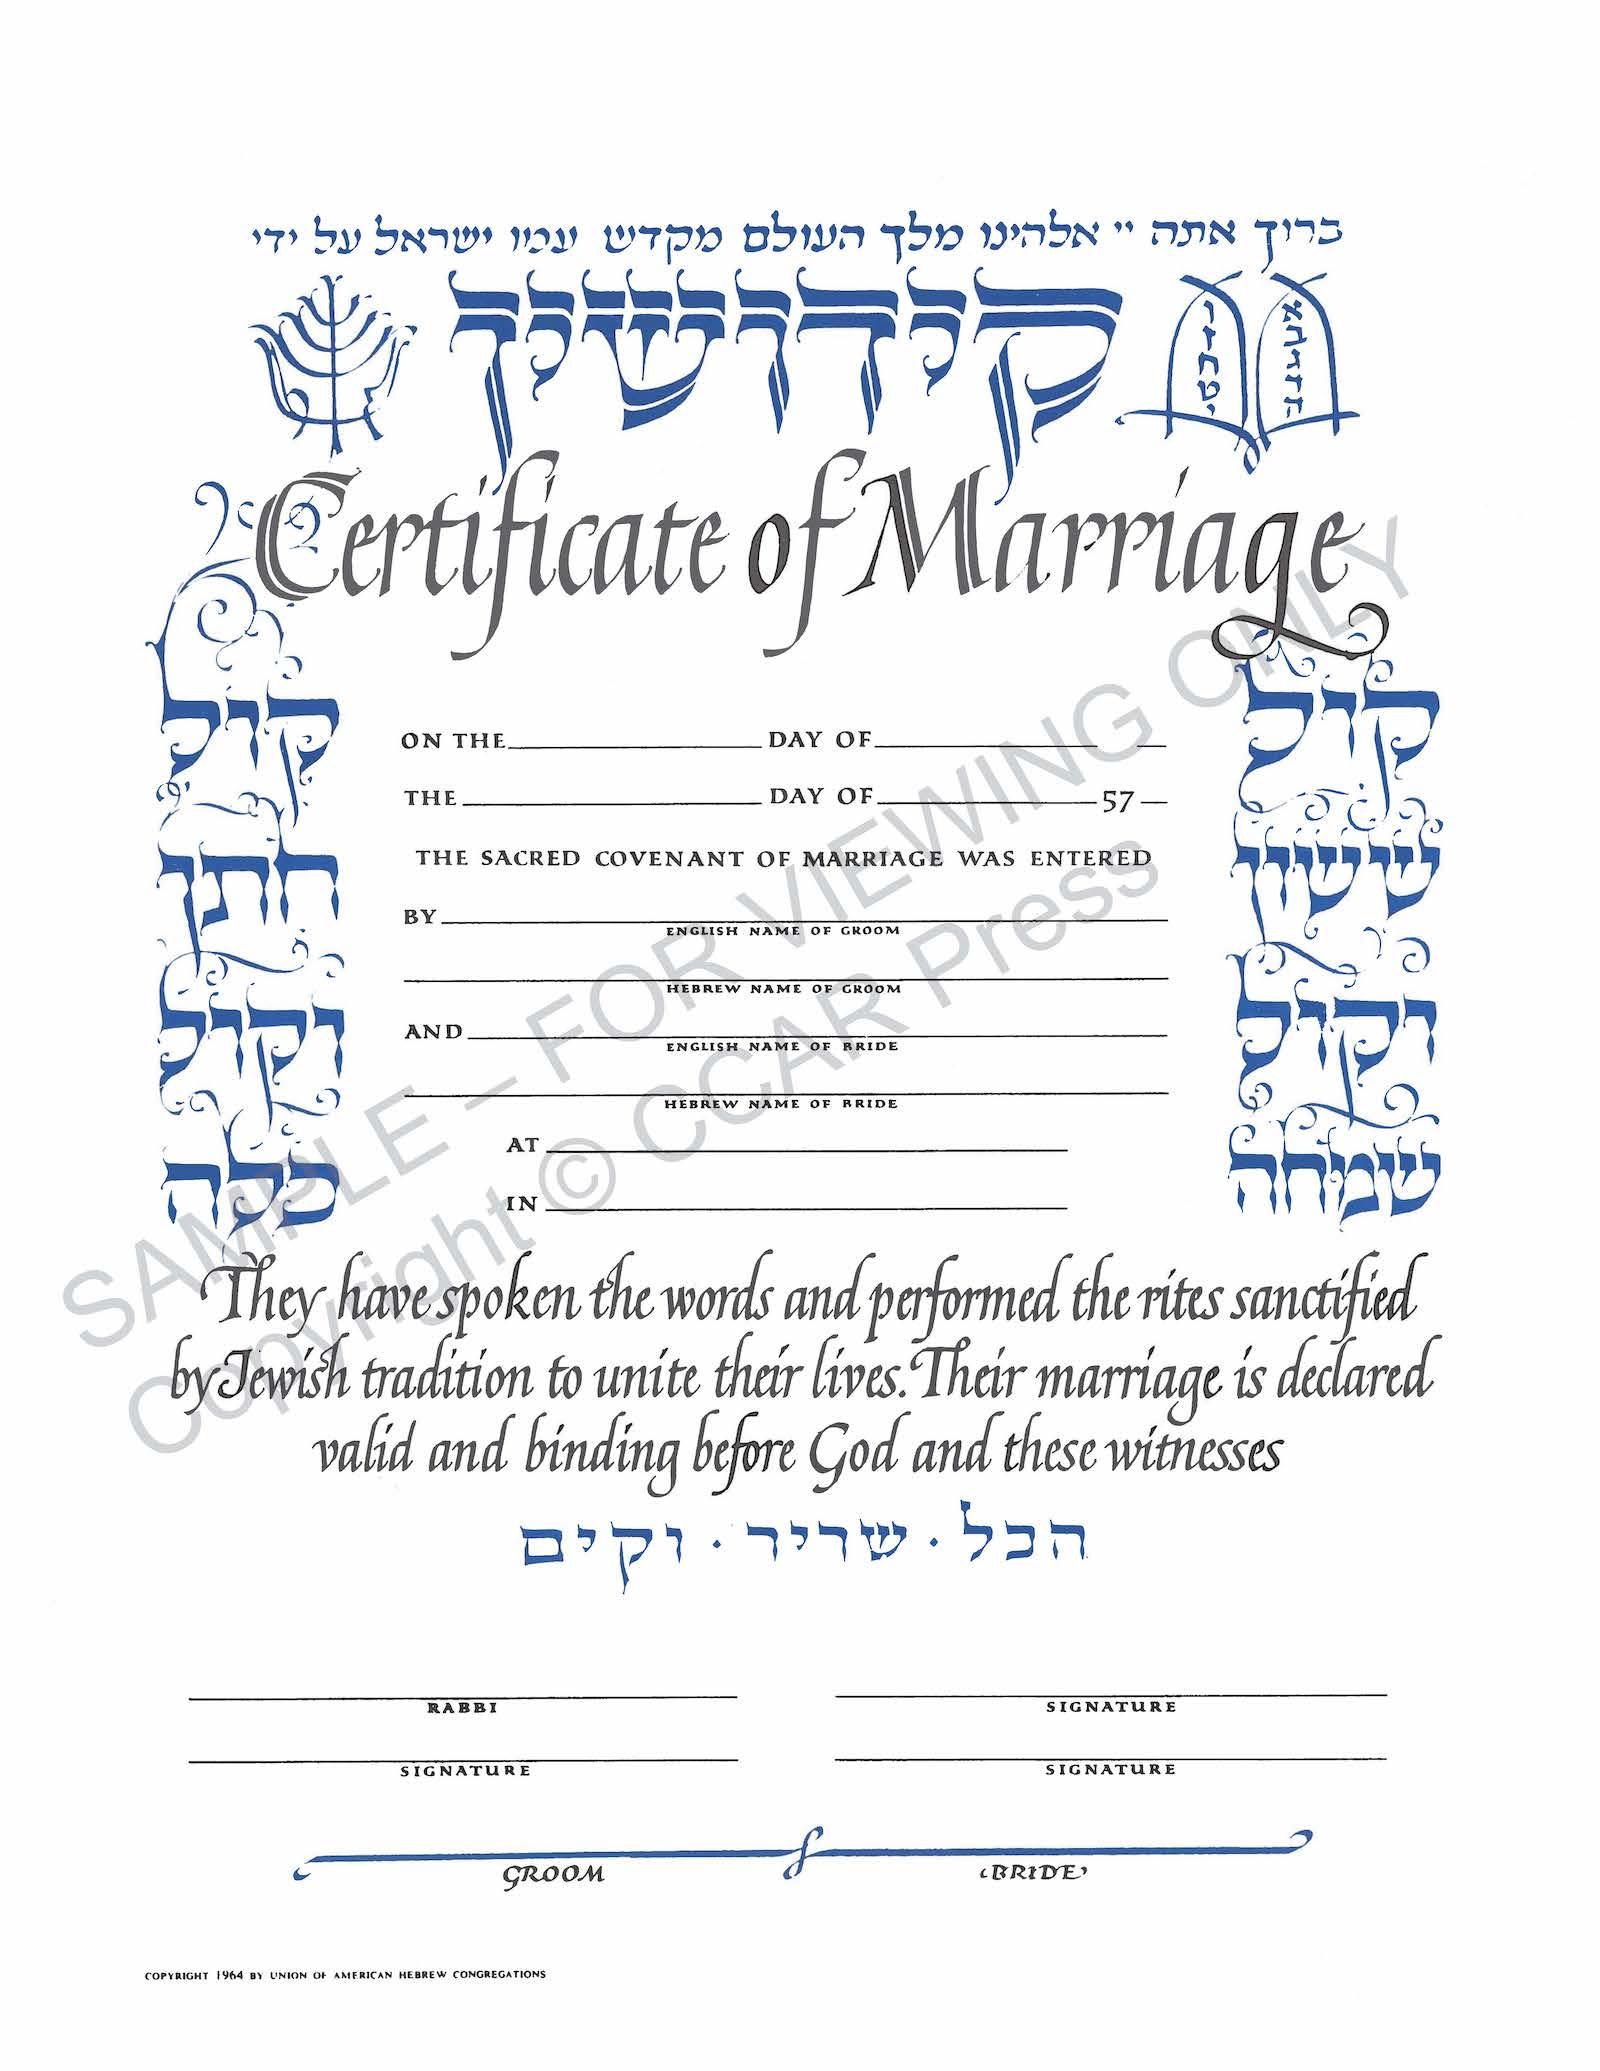 Marriage, Single - Certificate